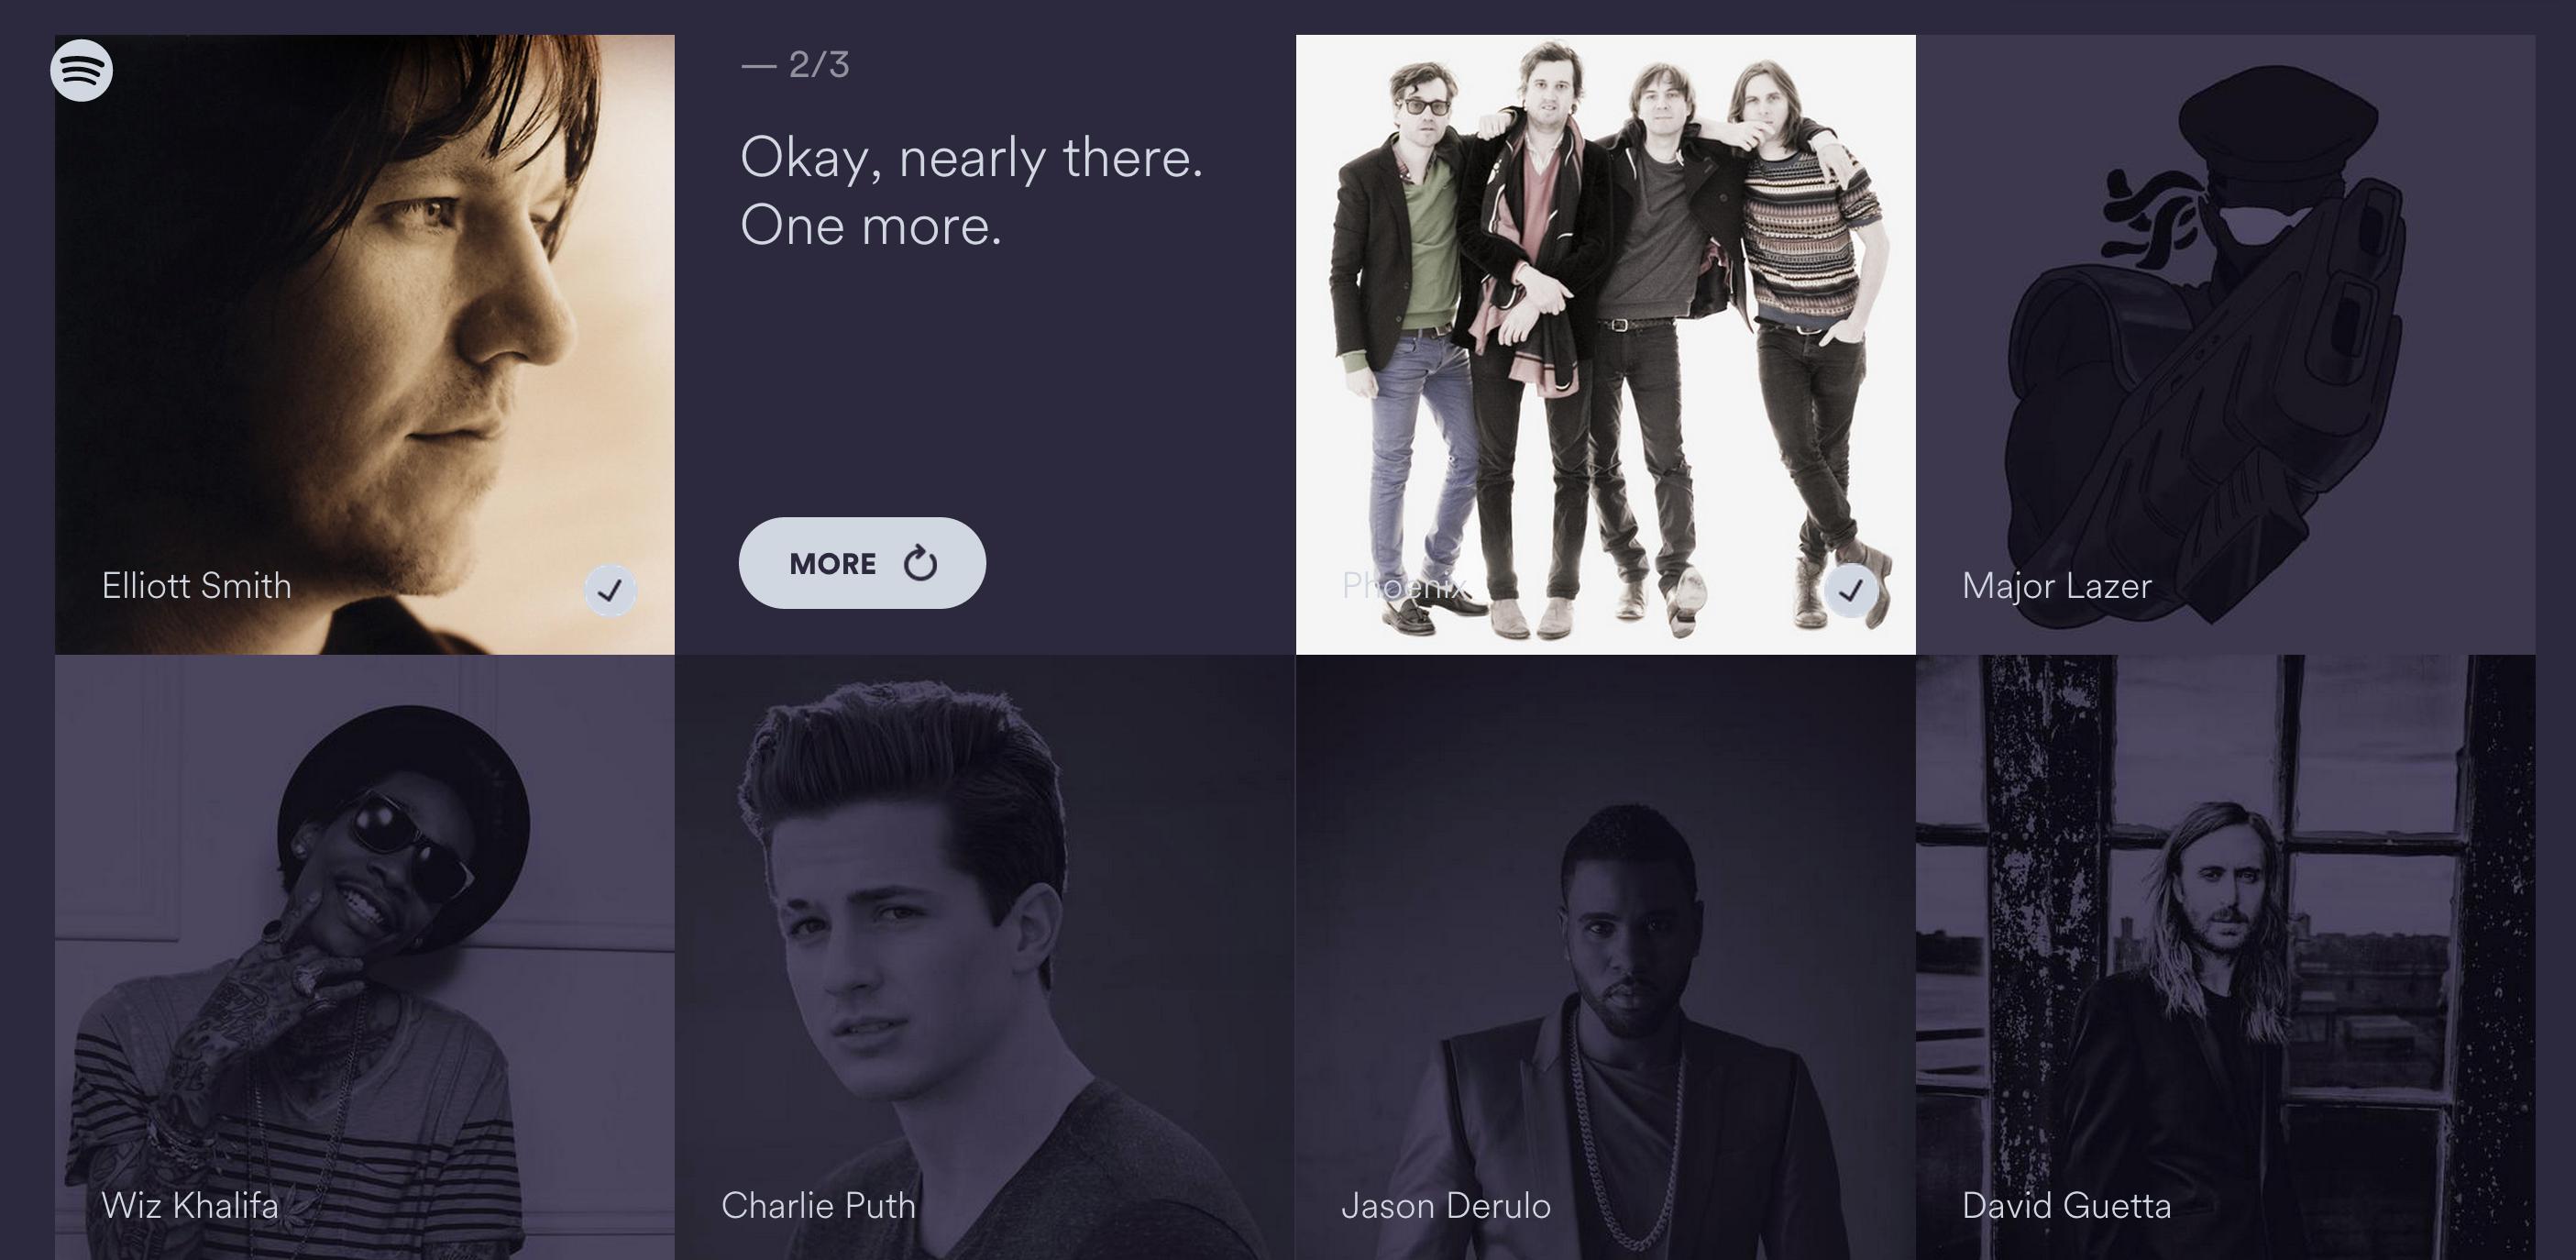 Spotify's